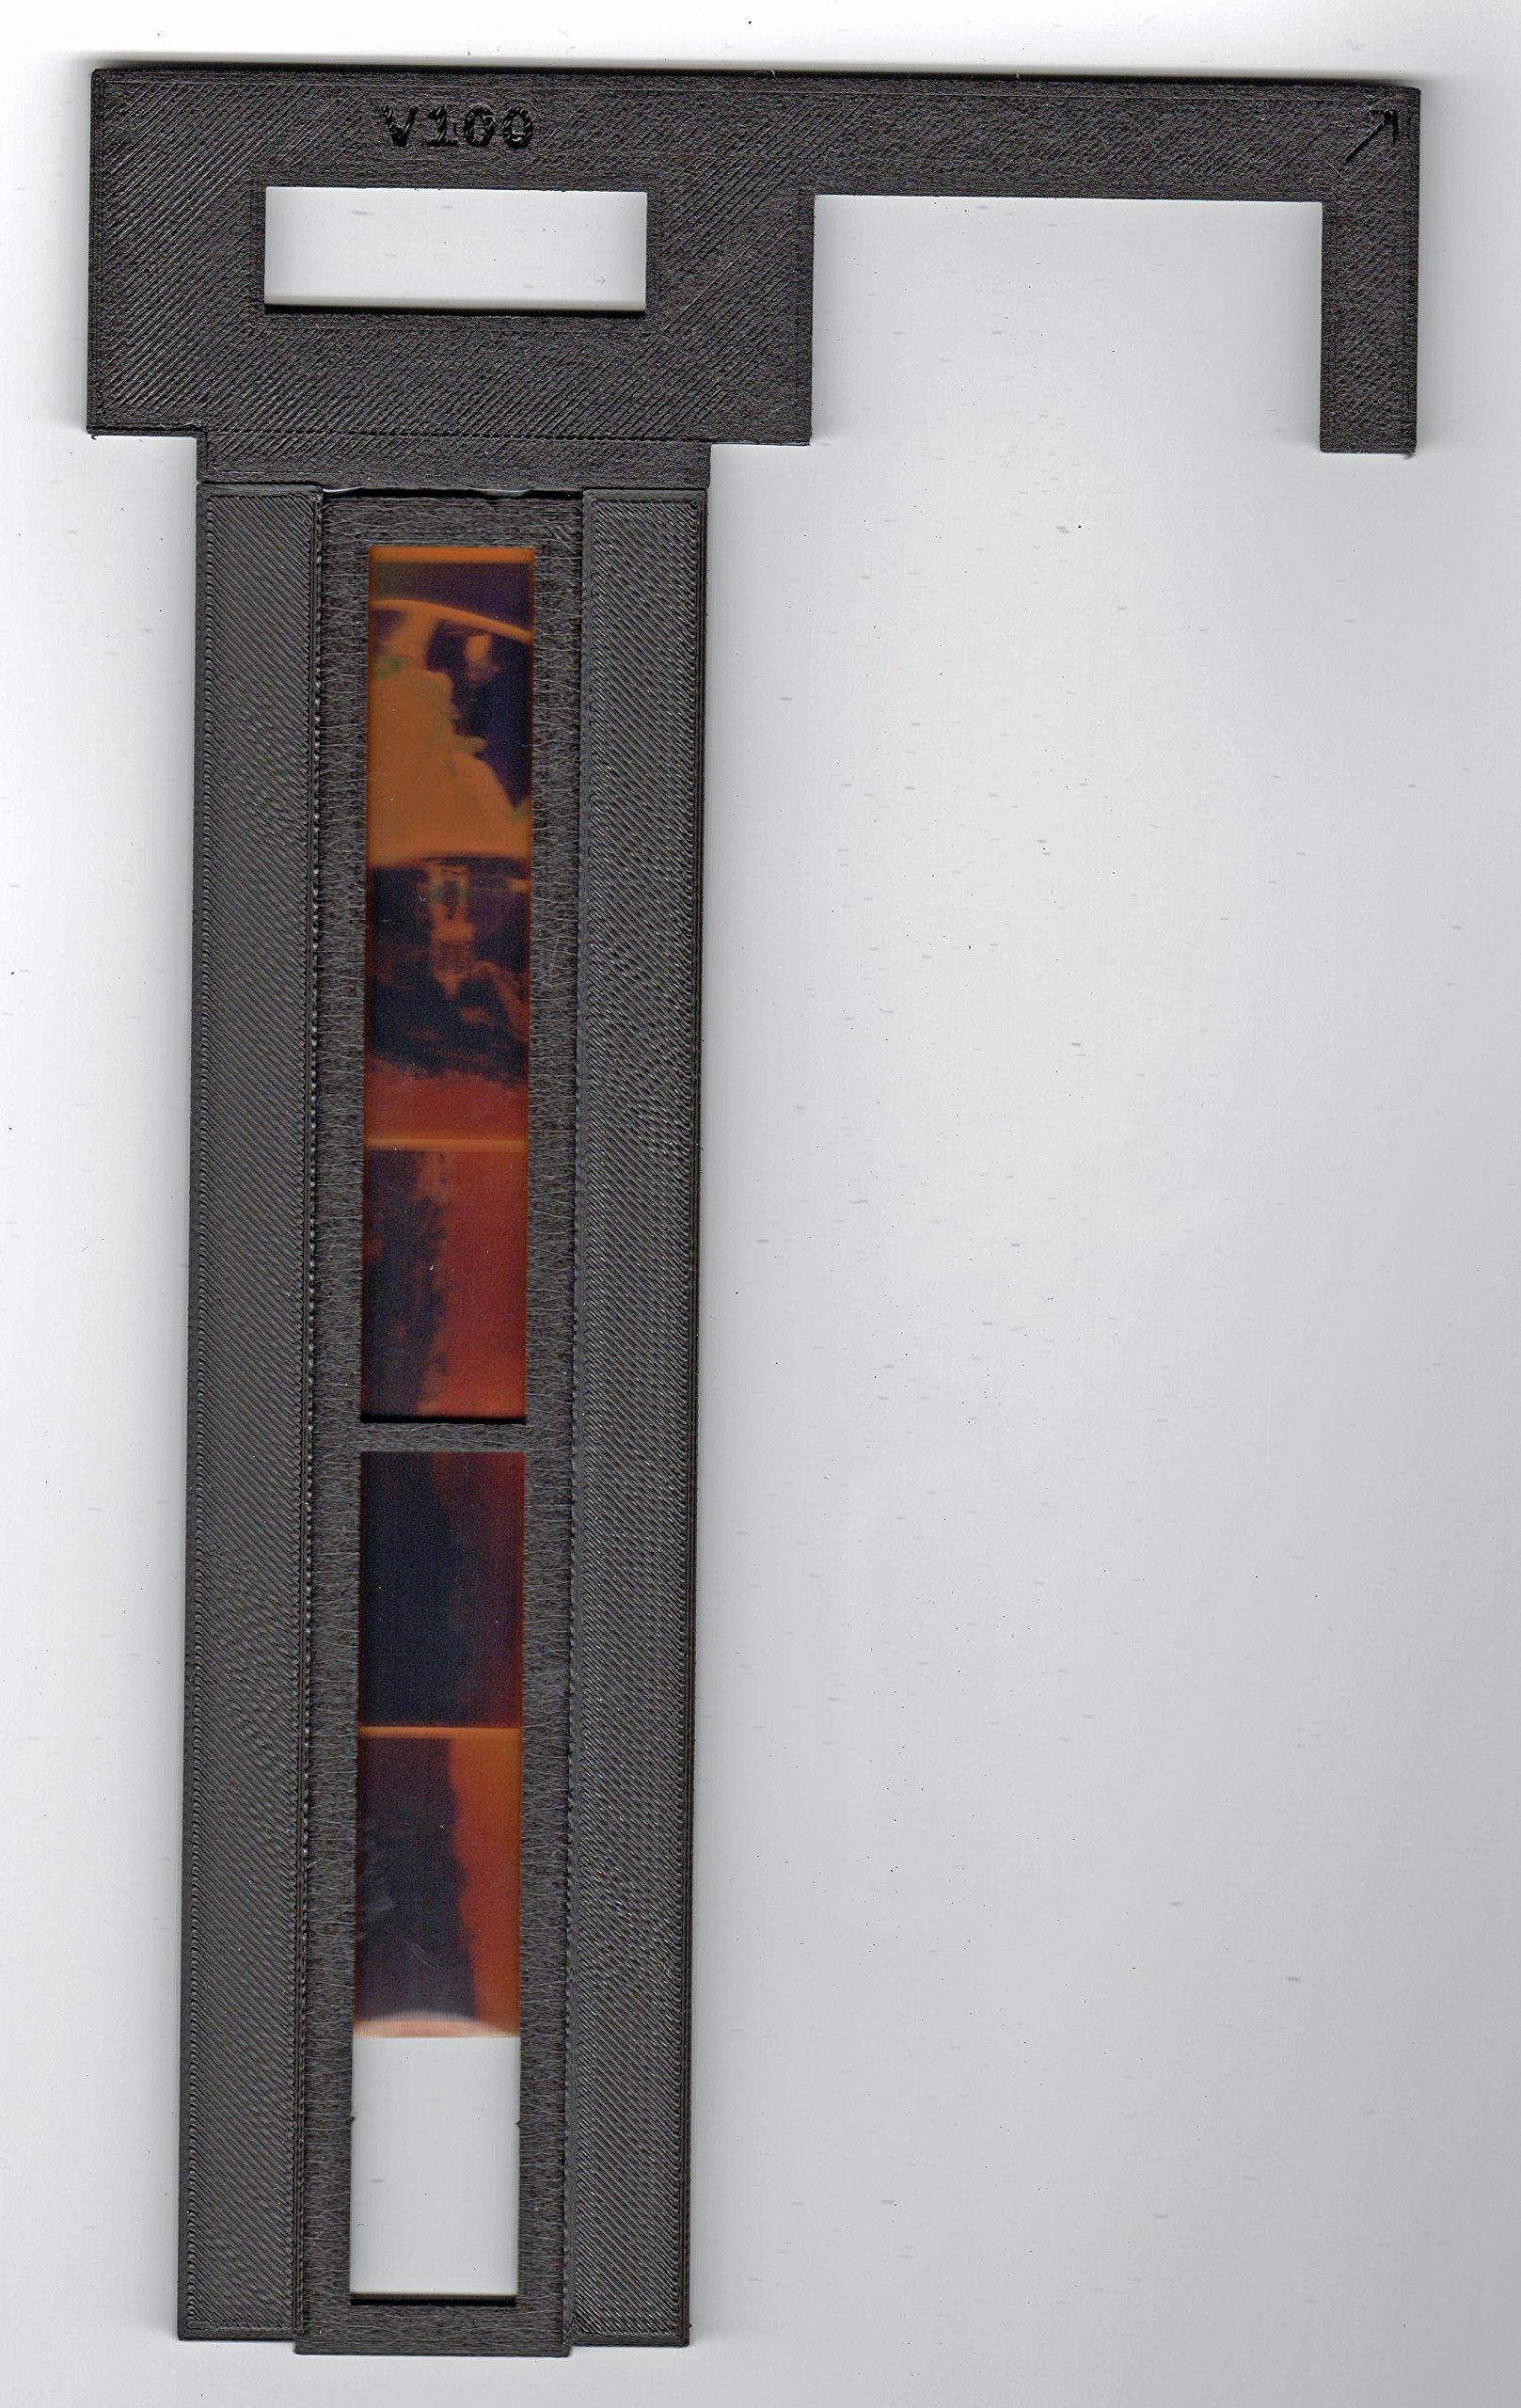 APS Film Holder for Epson Perfection V100/200/300/330/370 film scanners